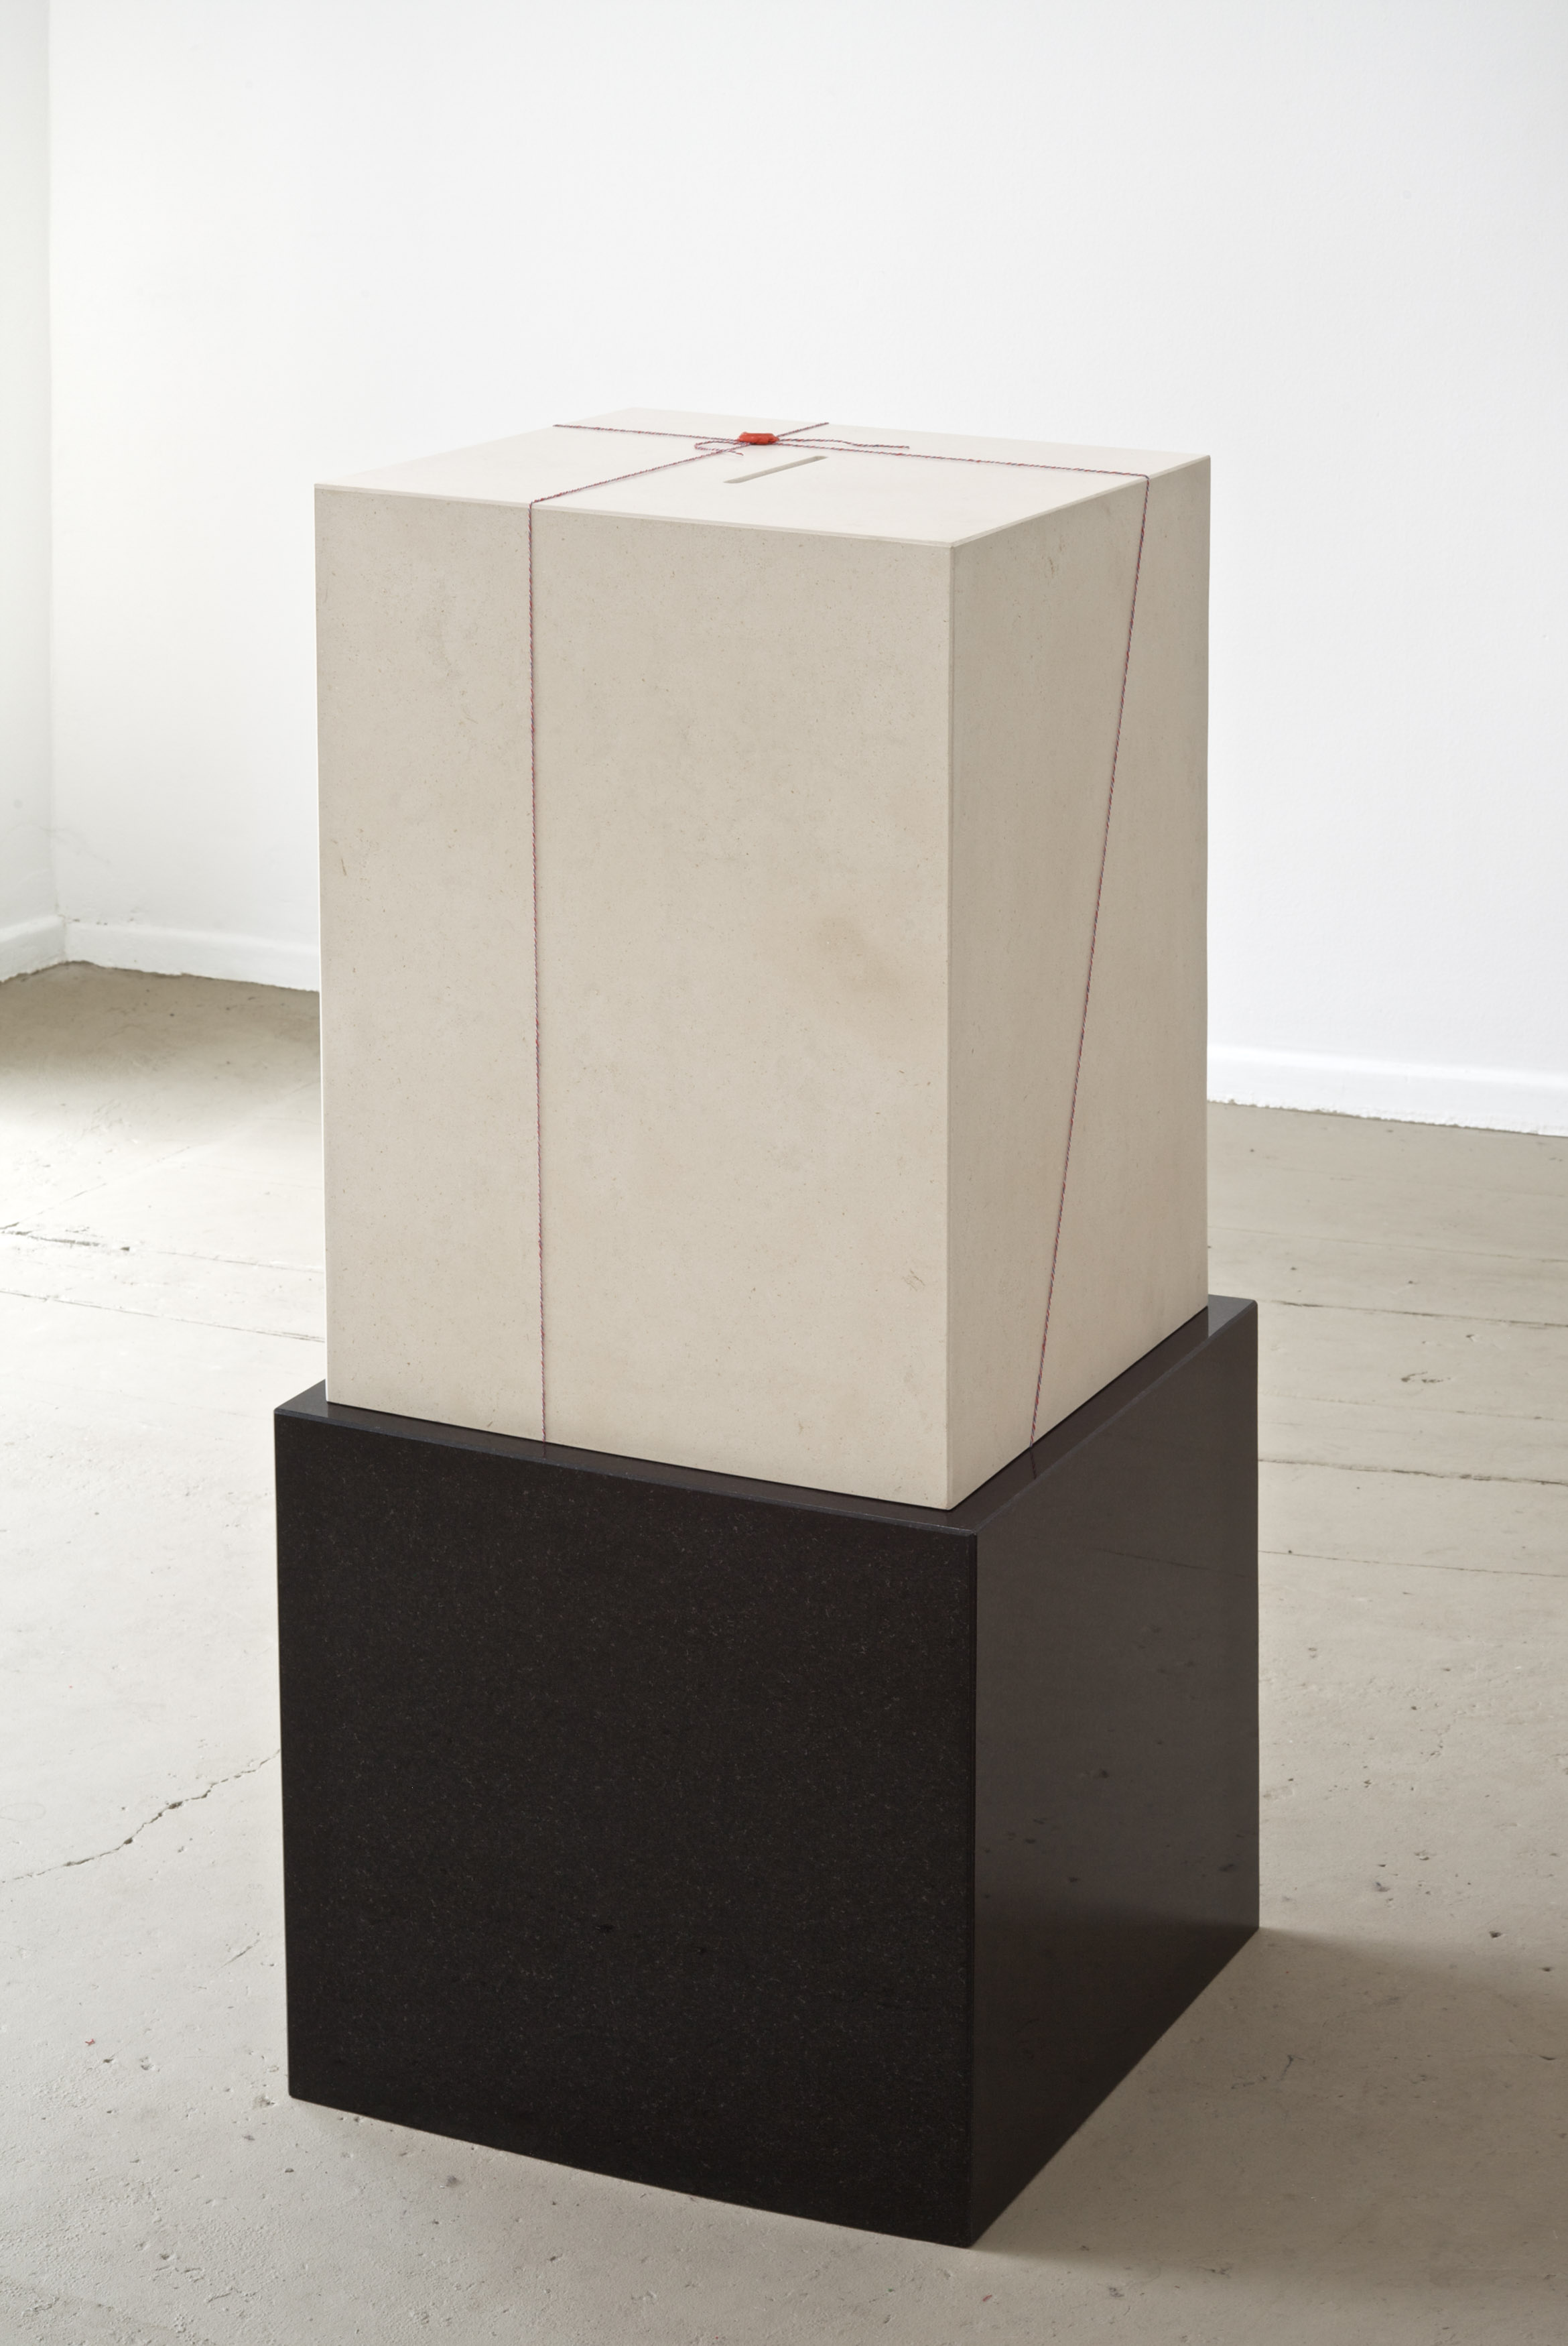 Šejla Kamerić - Ballot Box, 2012